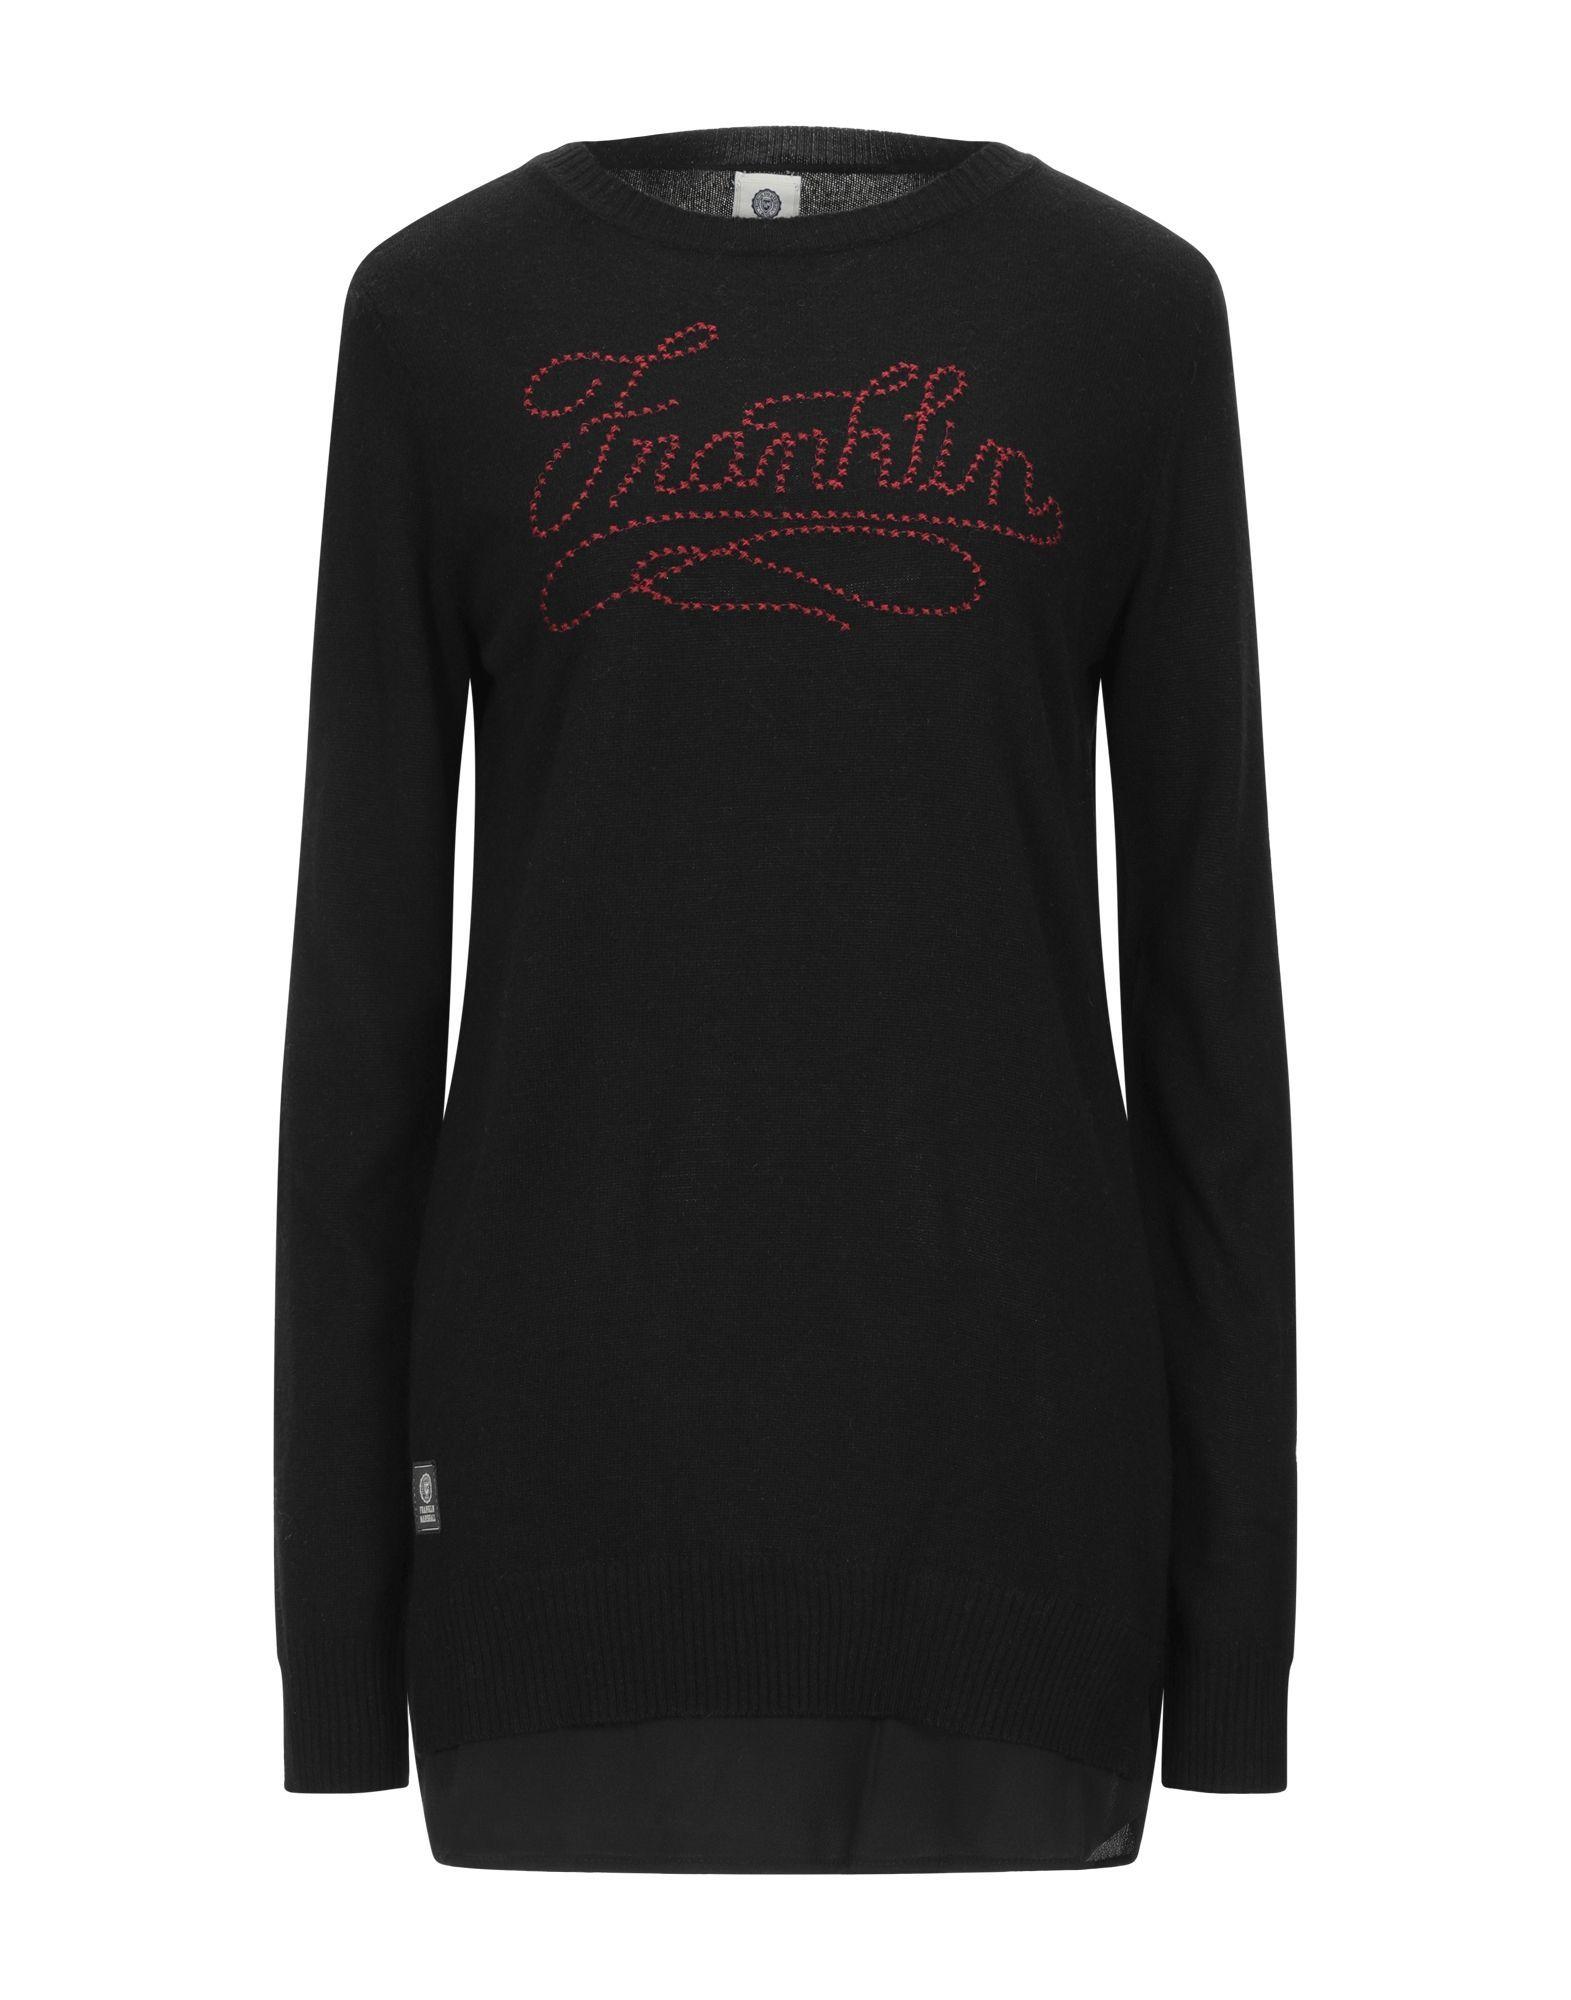 Franklin & Marshall Black Embroidered Knit Jumper